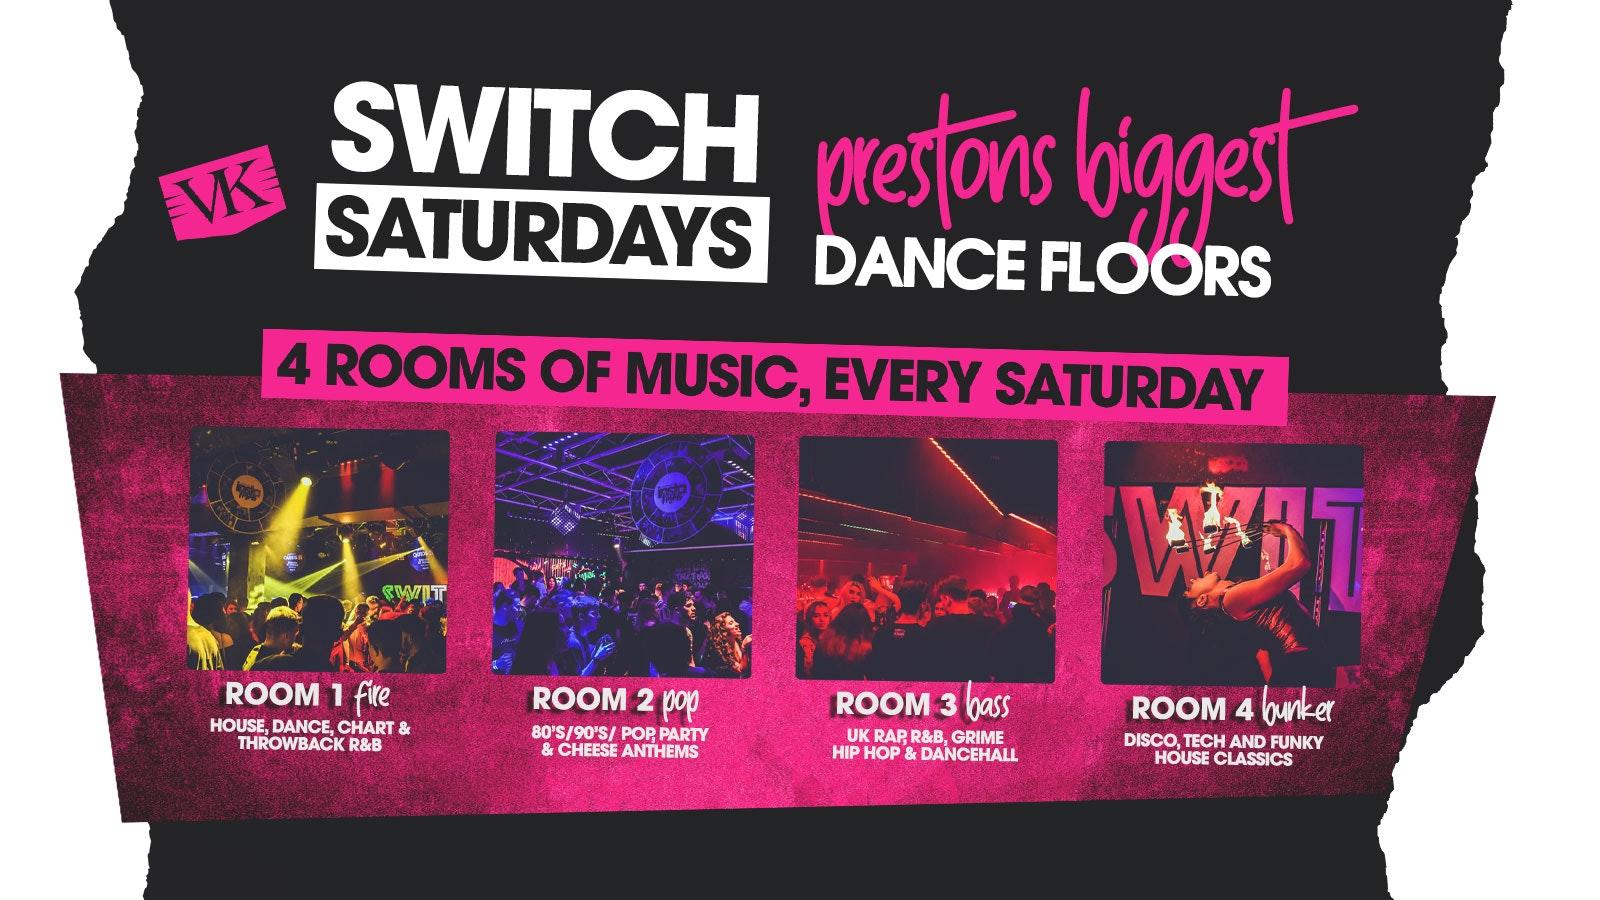 SWITCH Saturdays   Prestons Biggest Dance Floors   4 Rooms